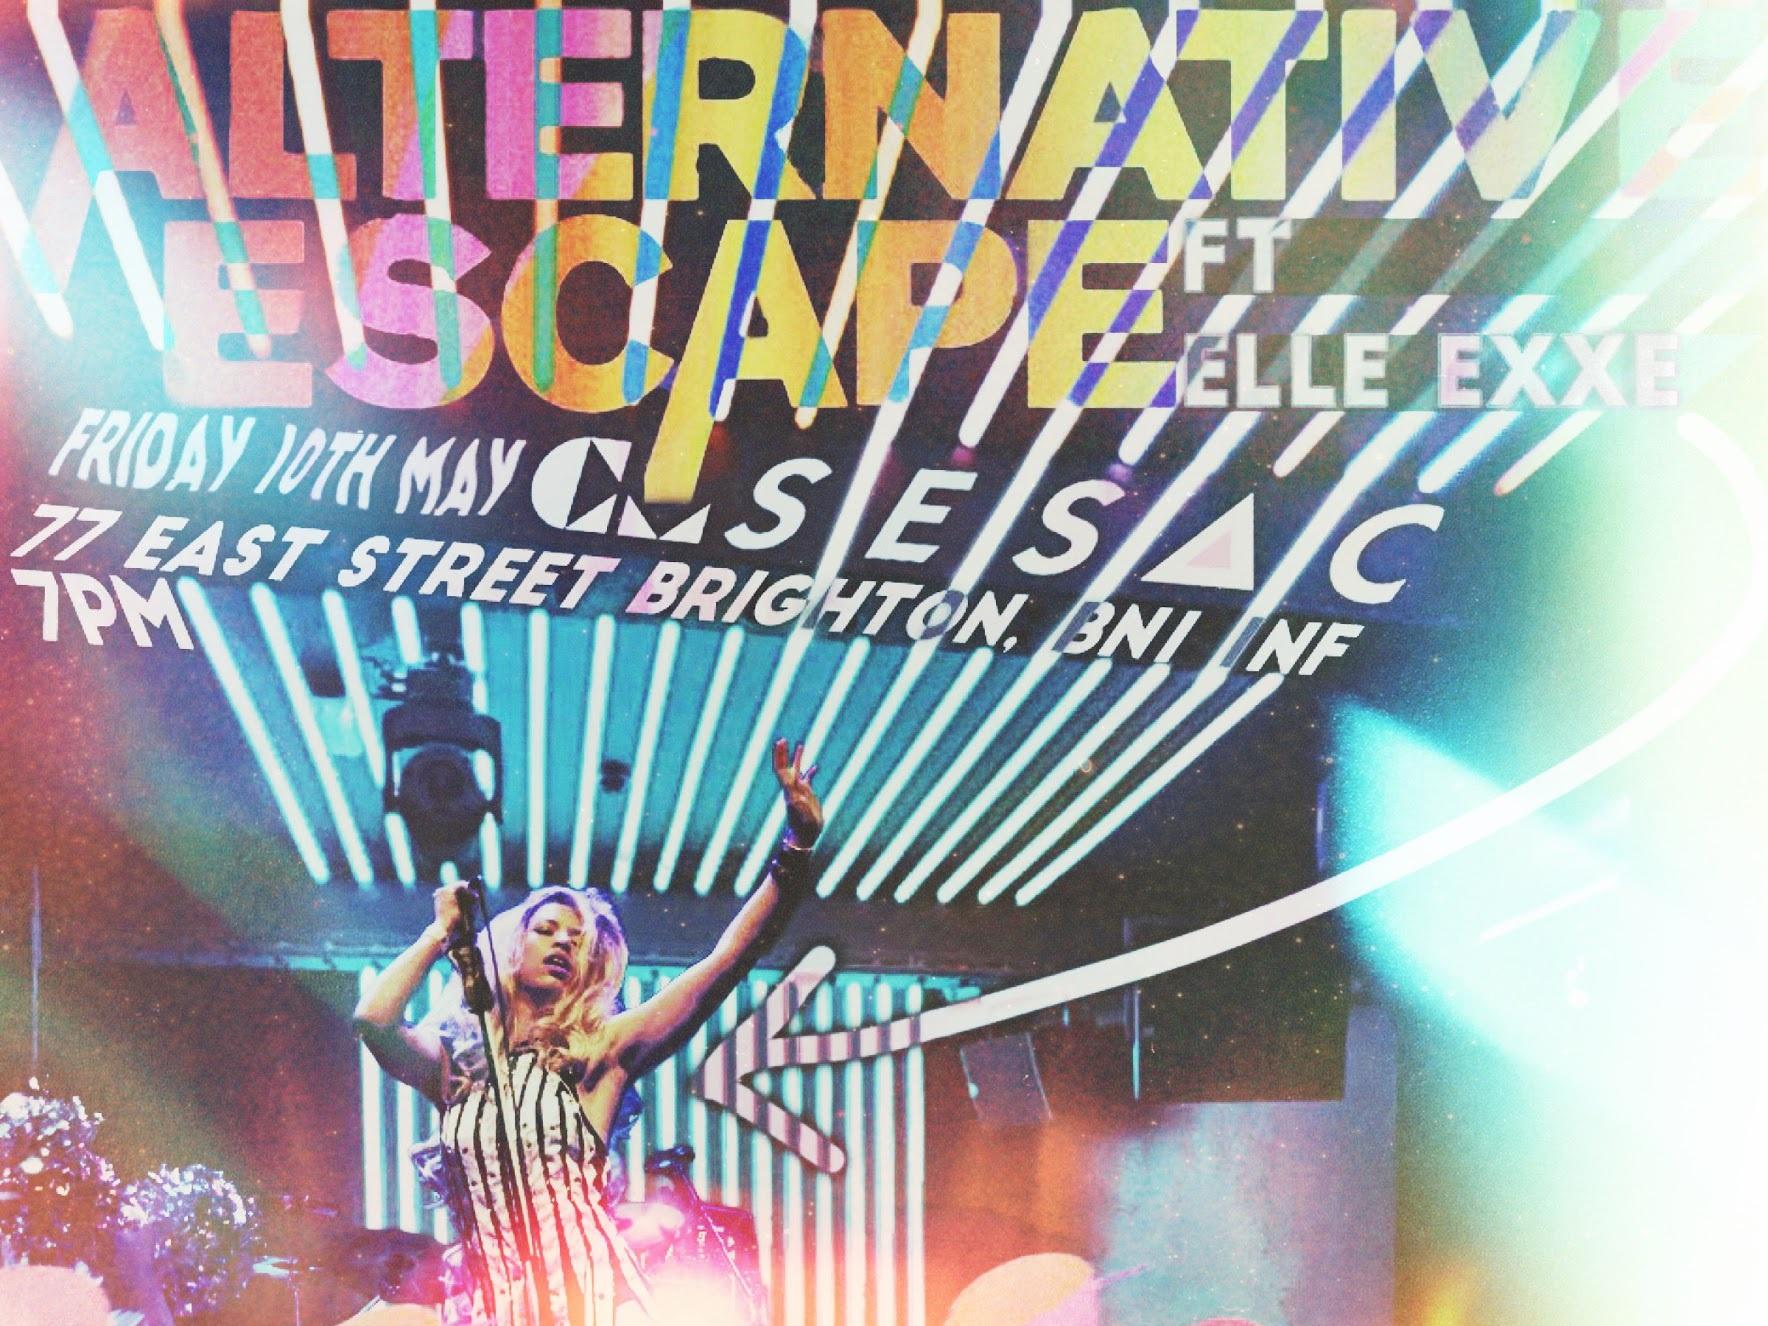 Brighton's Alternative Escape festival on Friday 10th May 2019 at BauWow Door 77